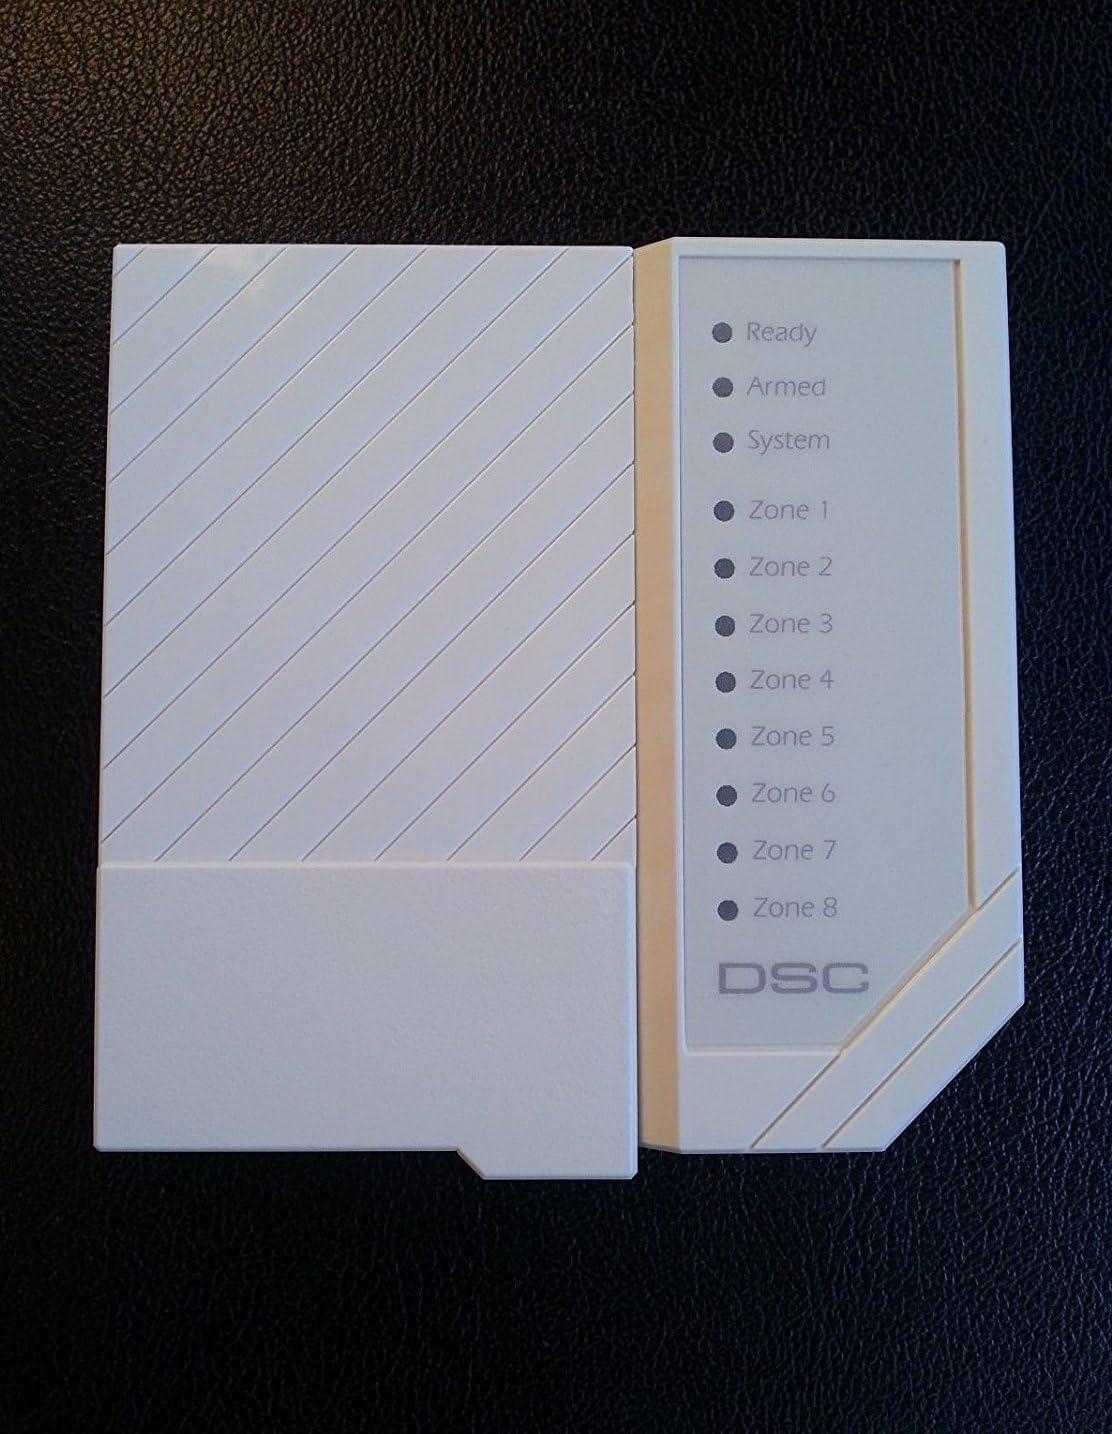 DSC Sistema de alarma de seguridad - Teclado LED PC1555